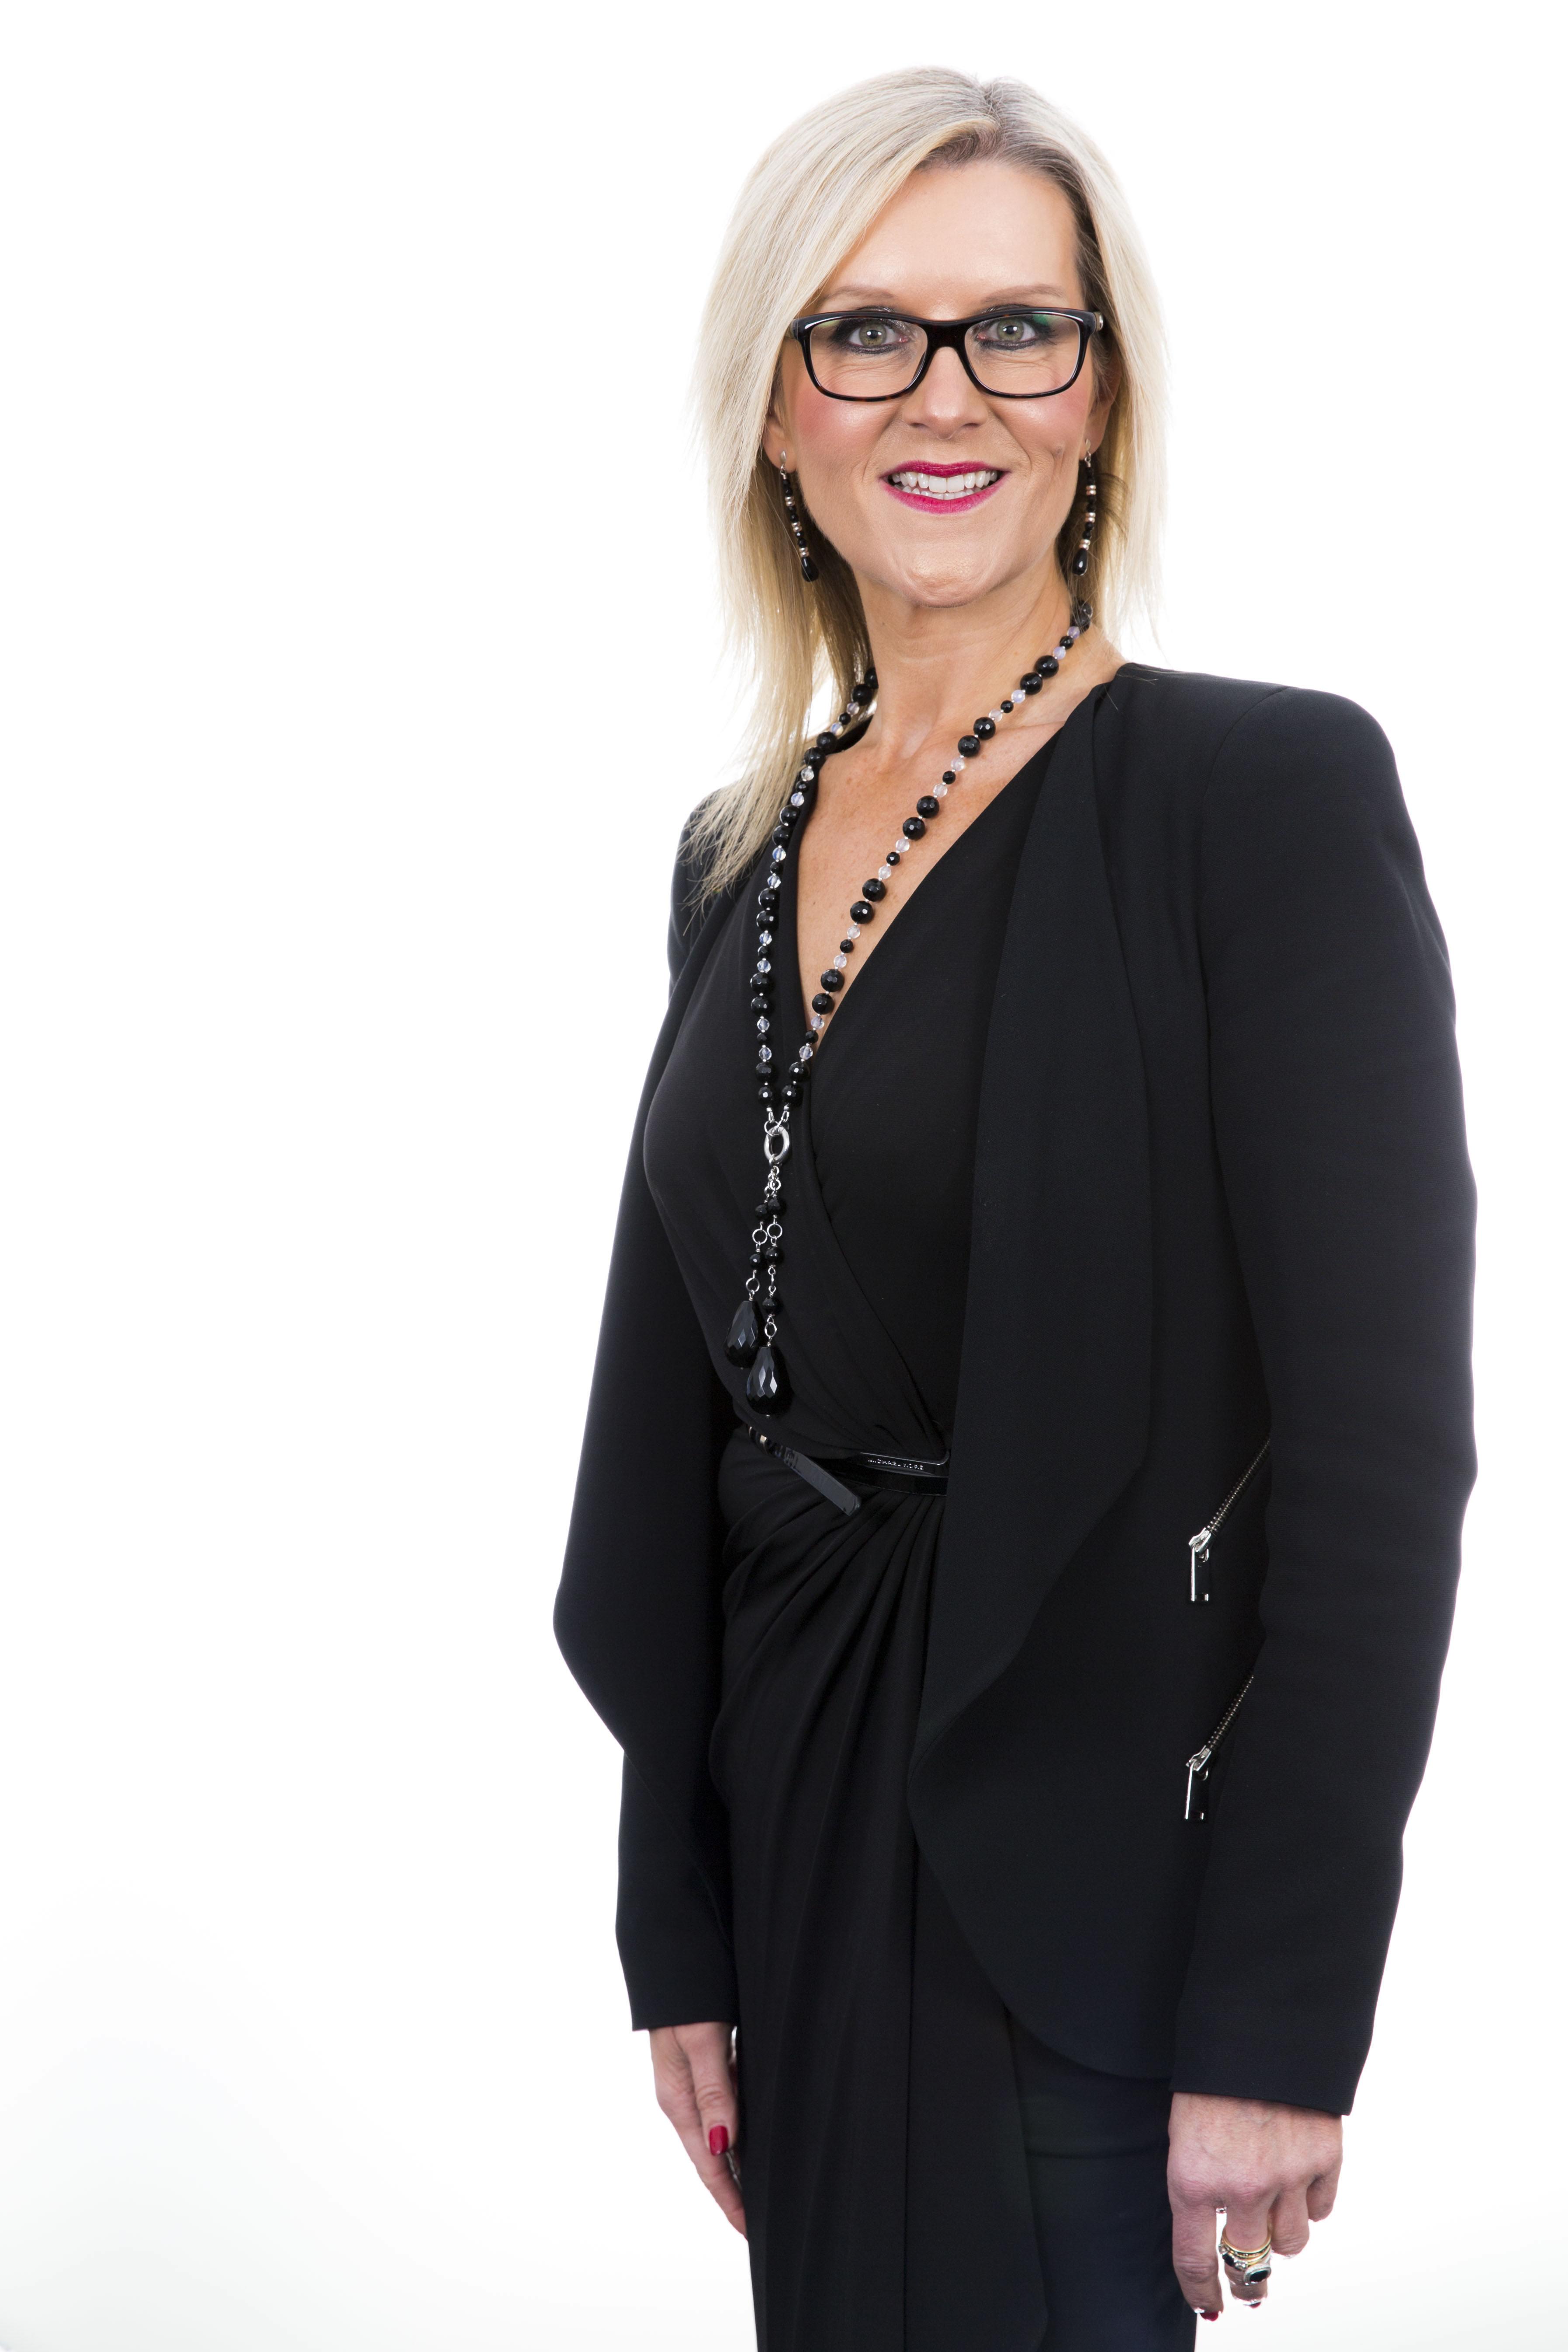 Tamara O'Brien